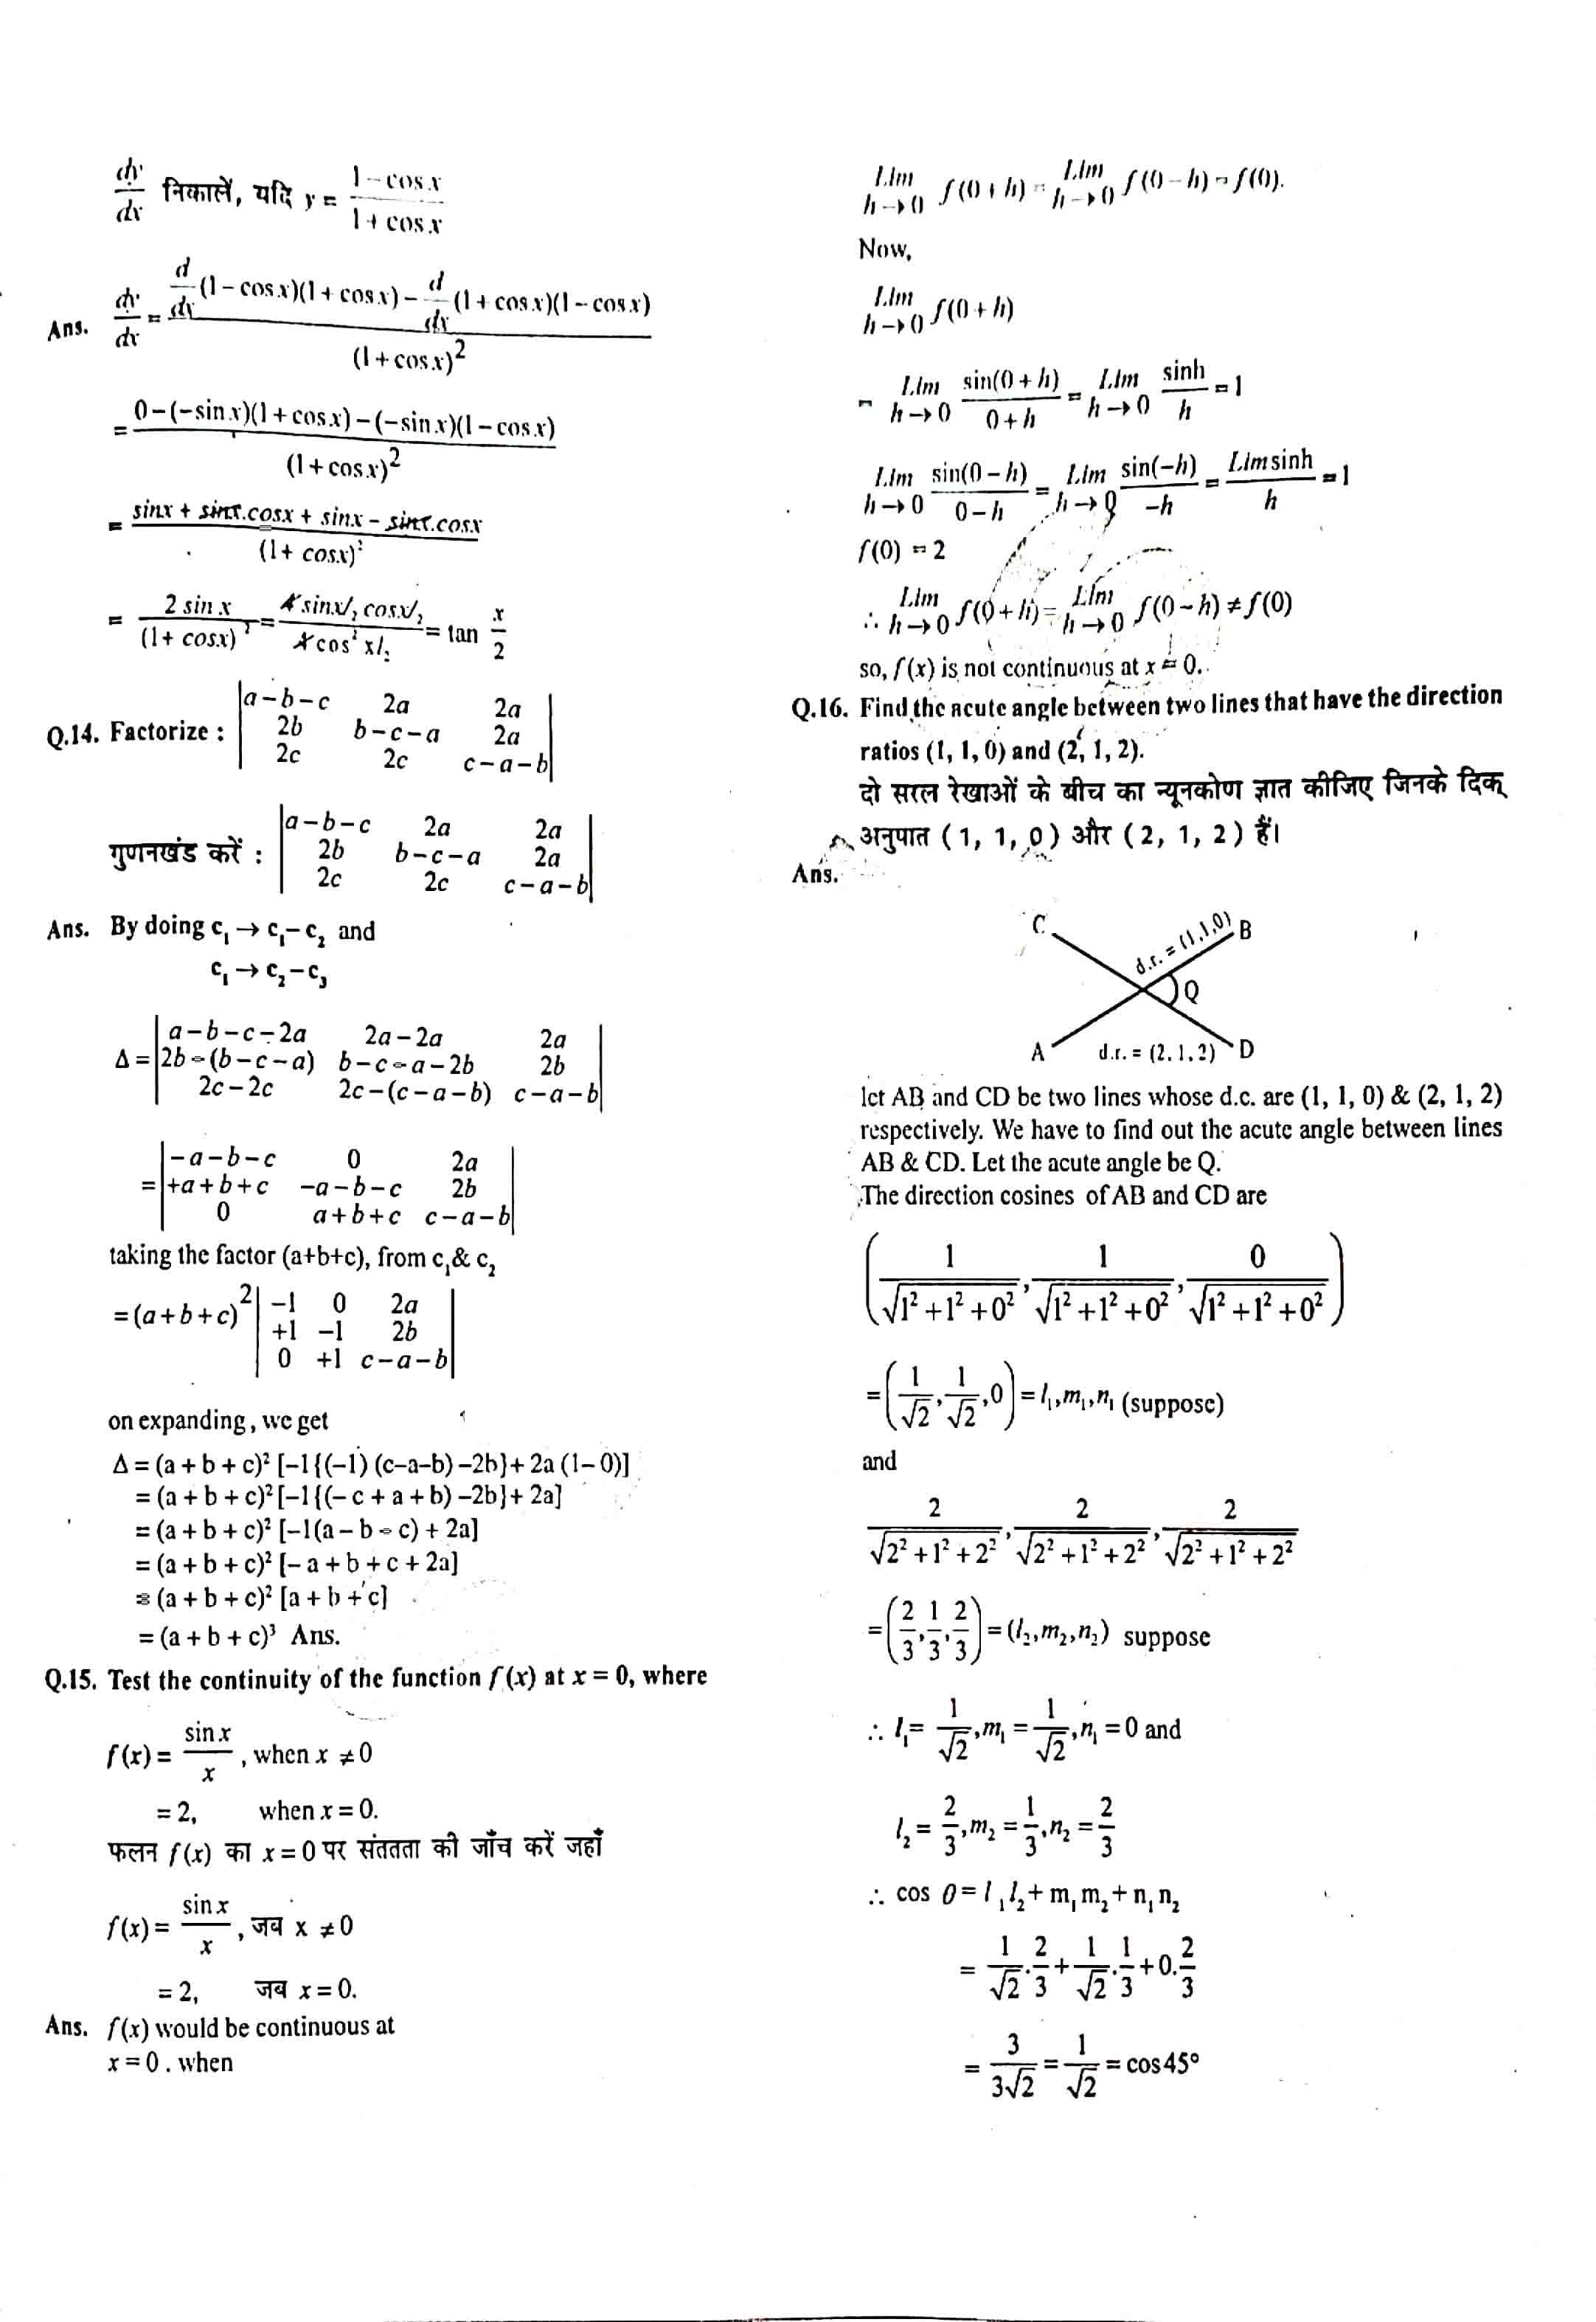 JAC Class 12 math 2013 Question Paper 03